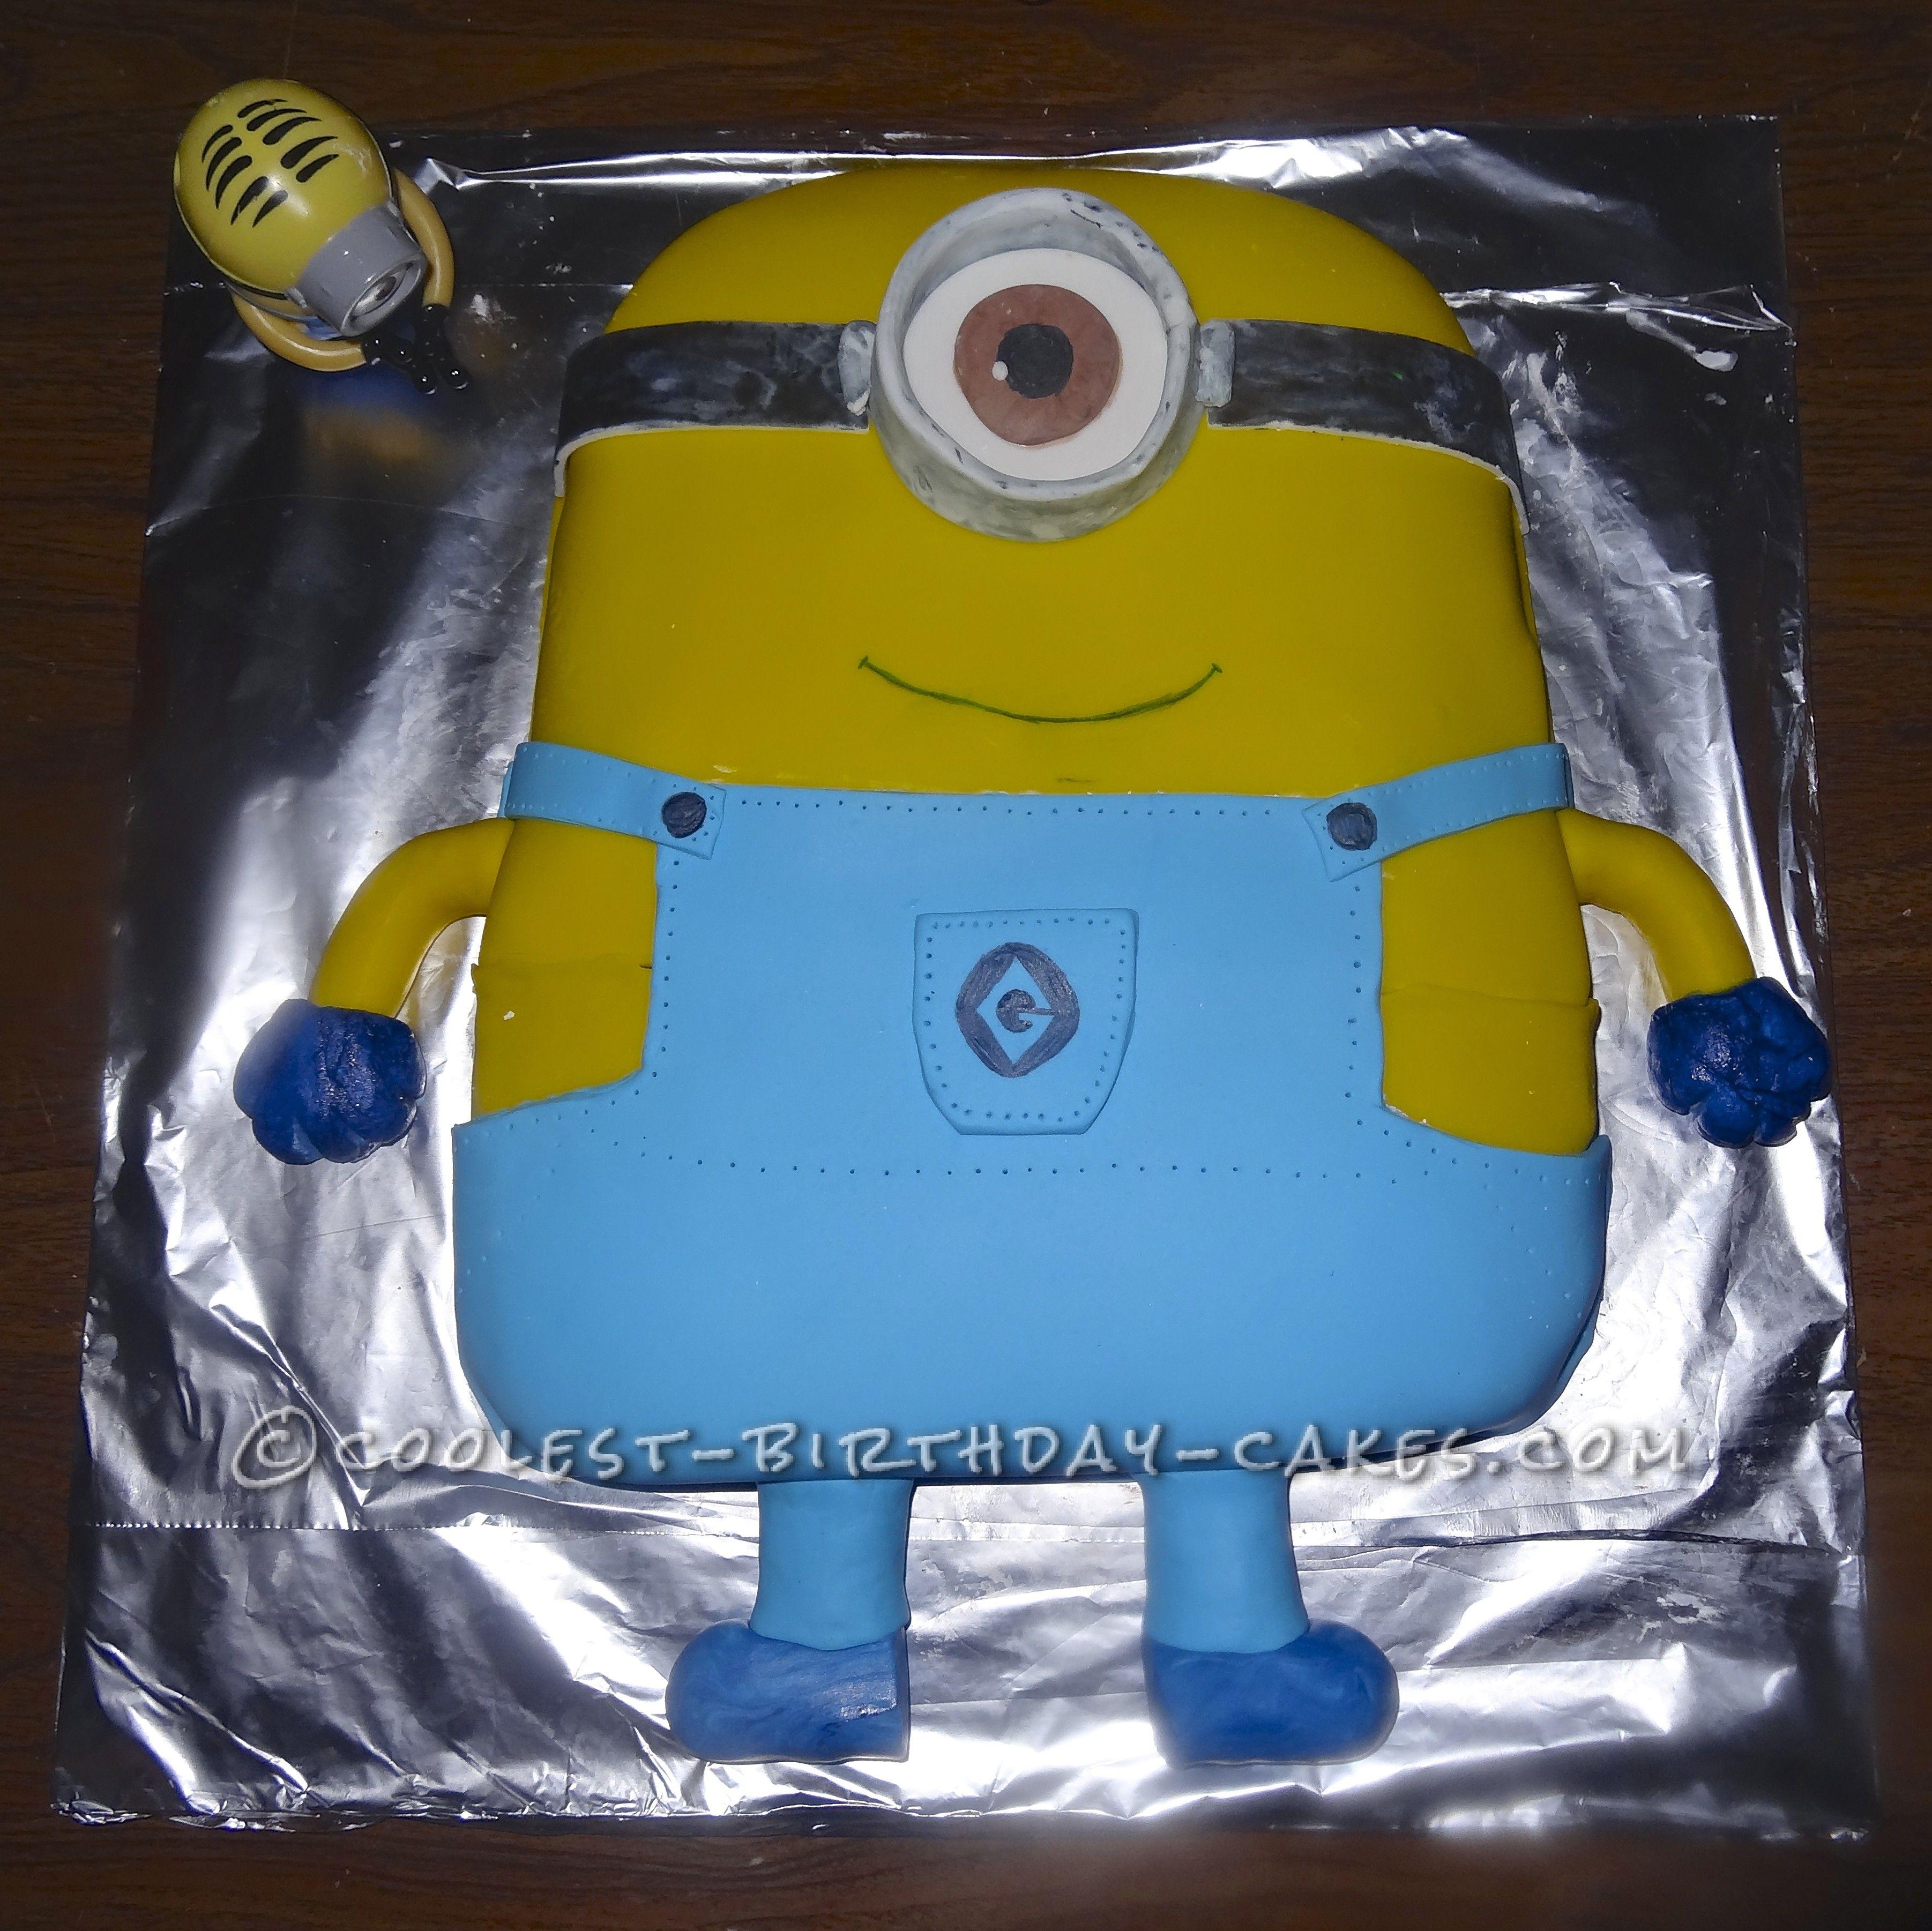 Stupendous Coolest Minion Birthday Cake From Despicable Me Minion Birthday Funny Birthday Cards Online Inifodamsfinfo